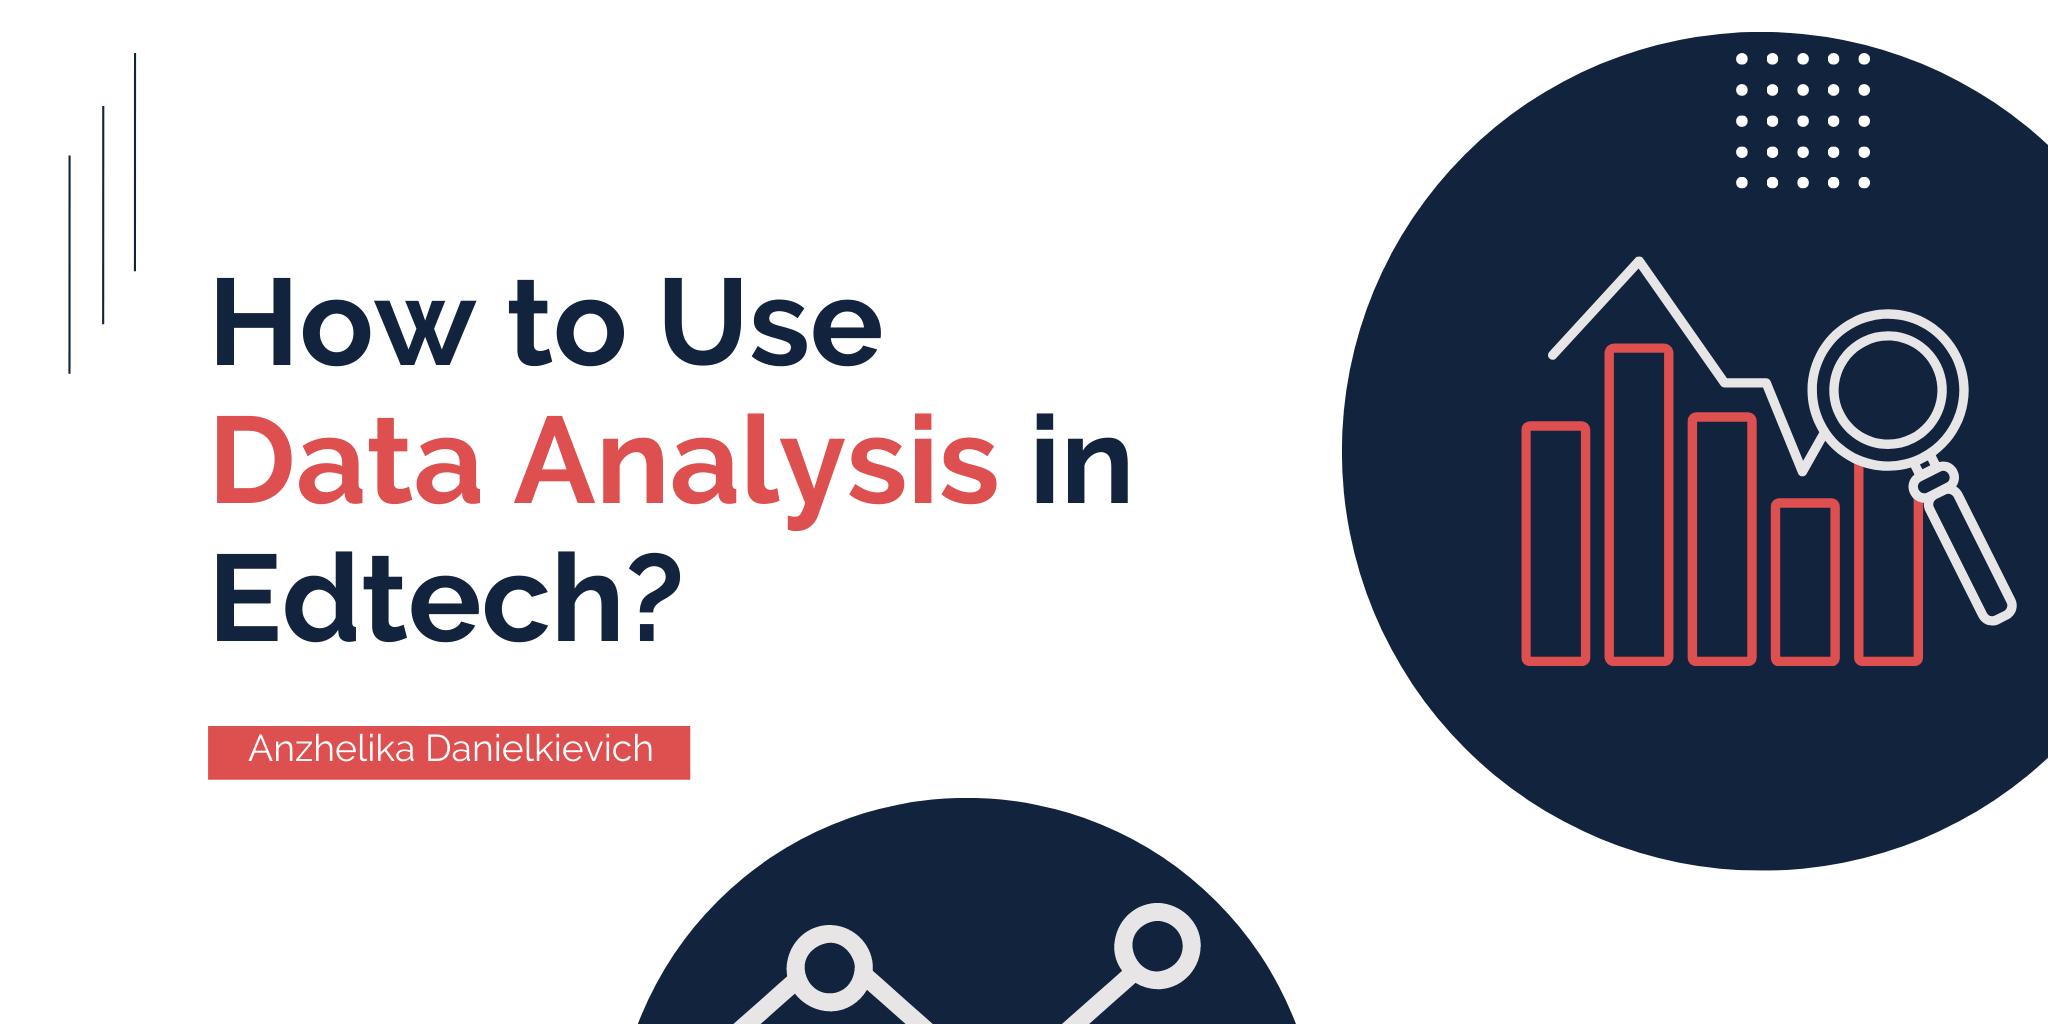 3 Ways to Use Data Analysis in Edtech